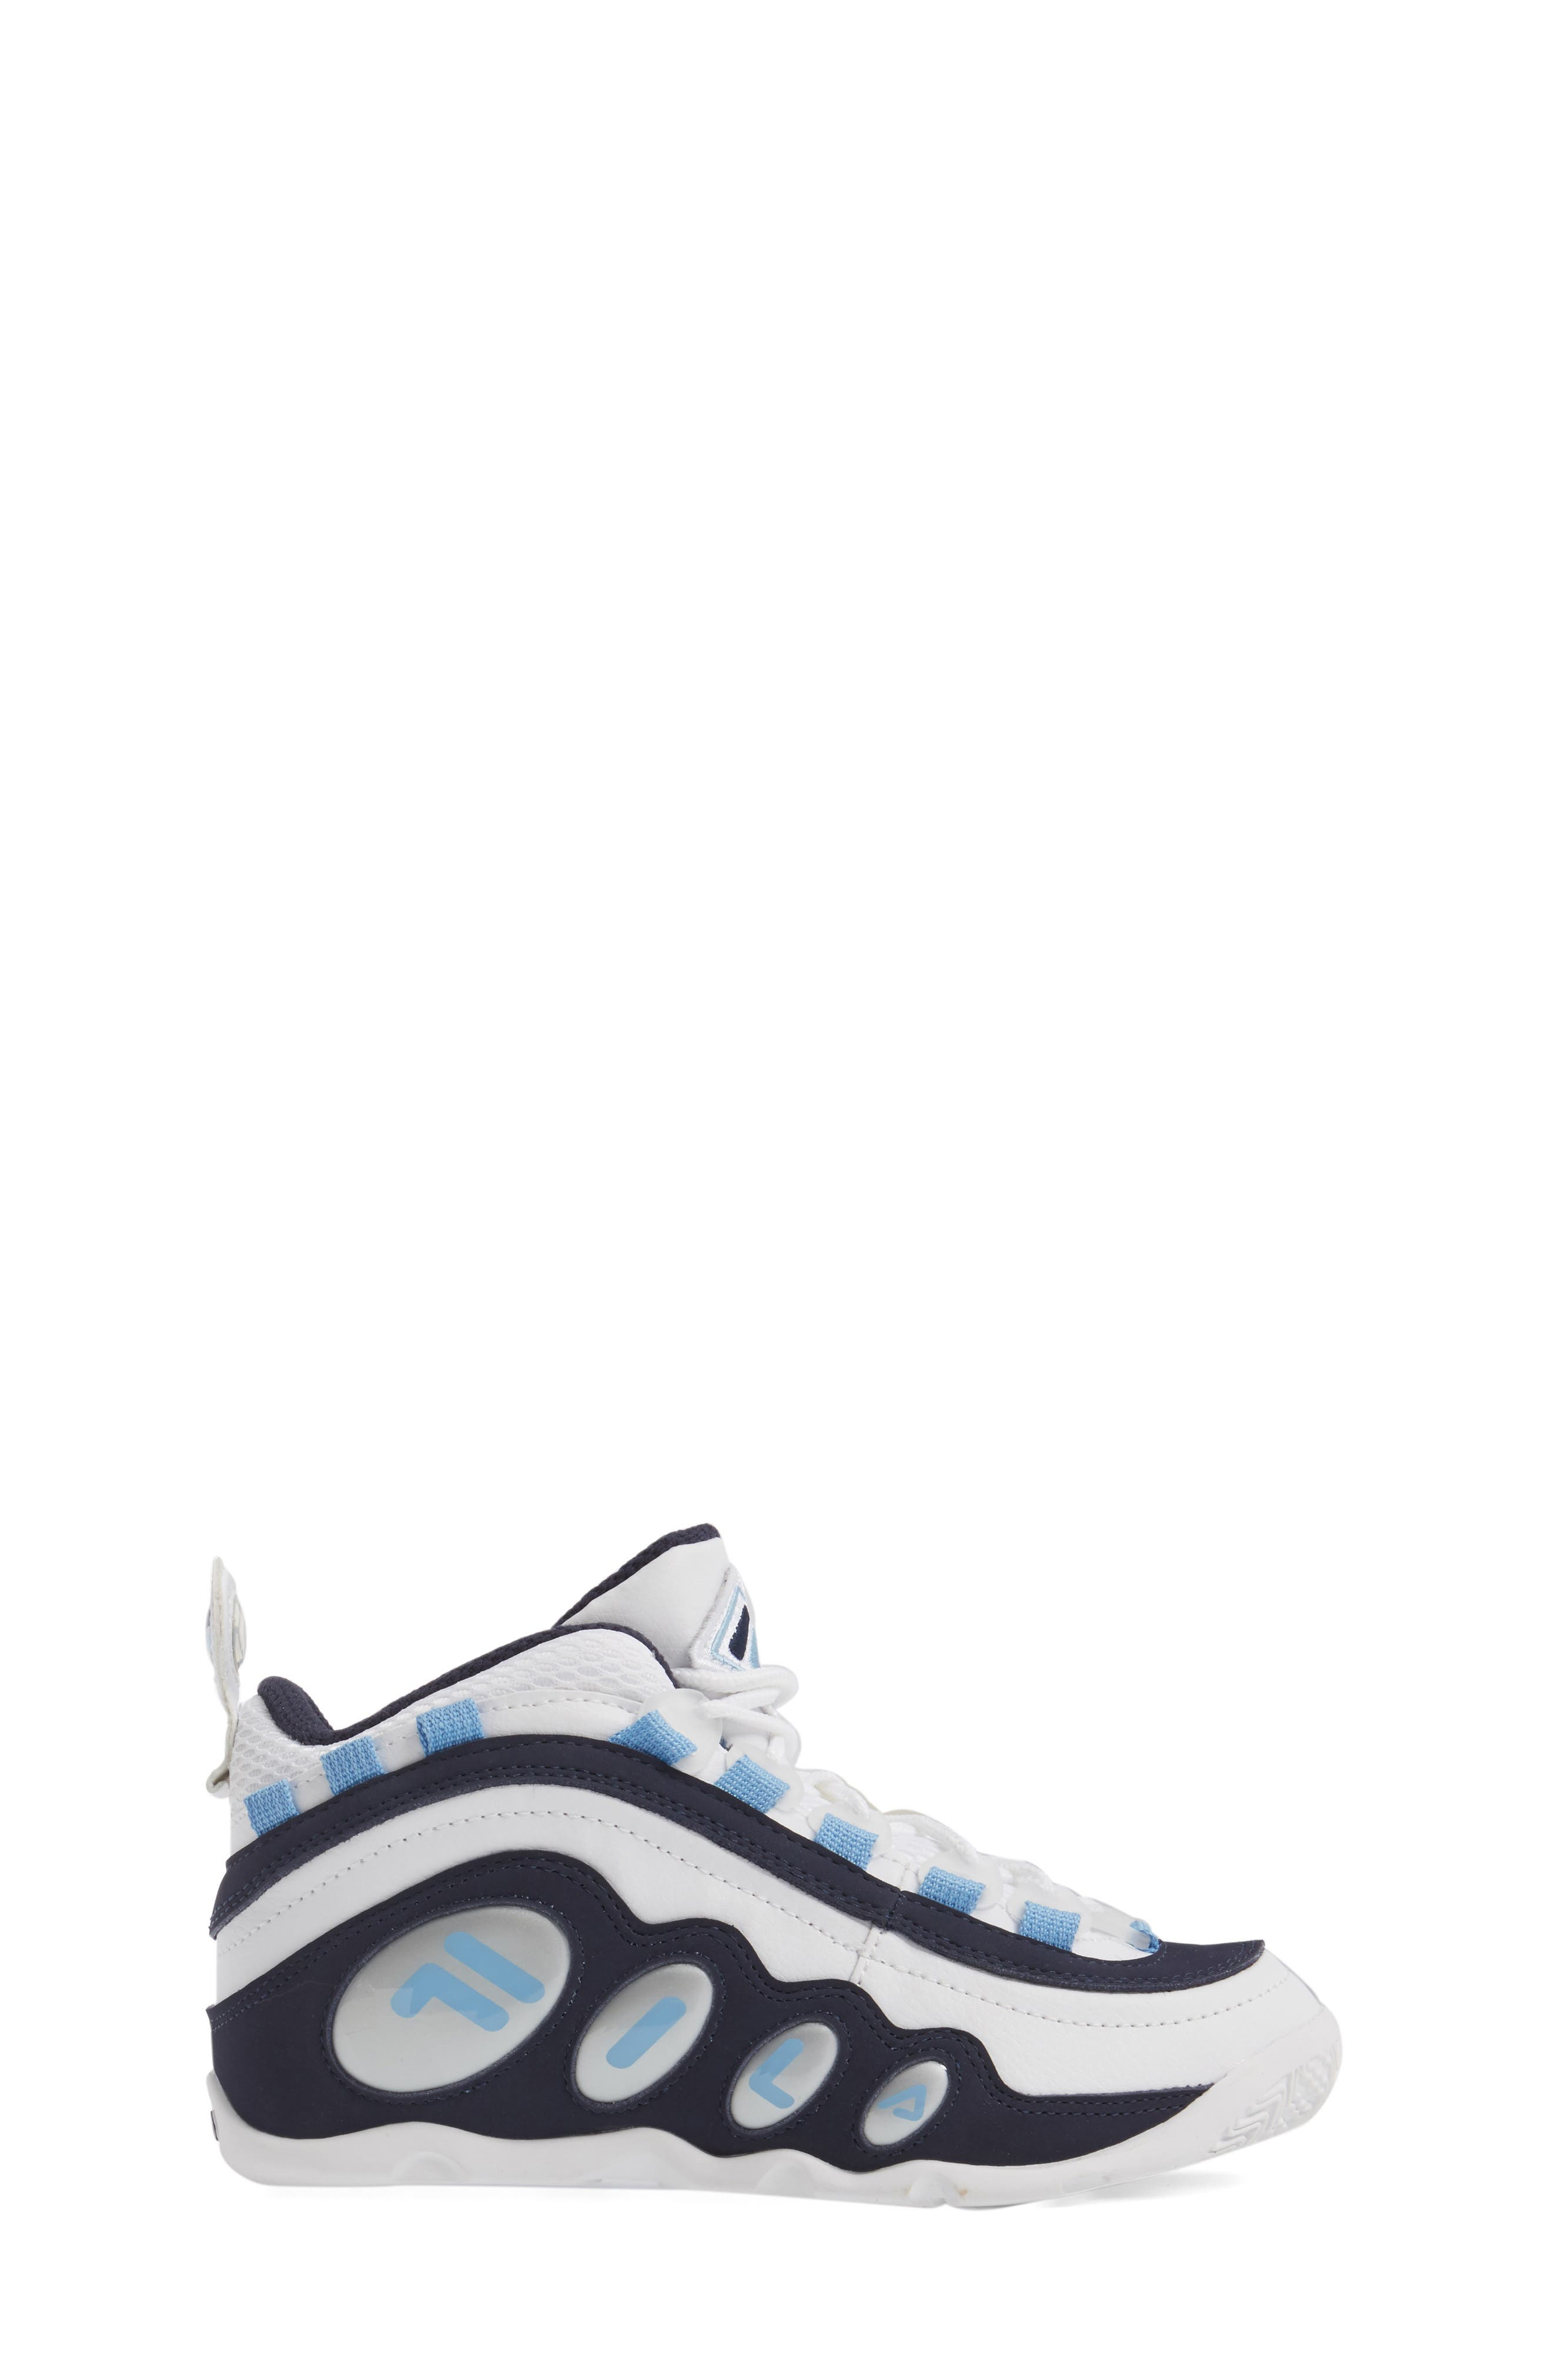 Bubbles Mid Top Sneaker,                             Alternate thumbnail 3, color,                             147